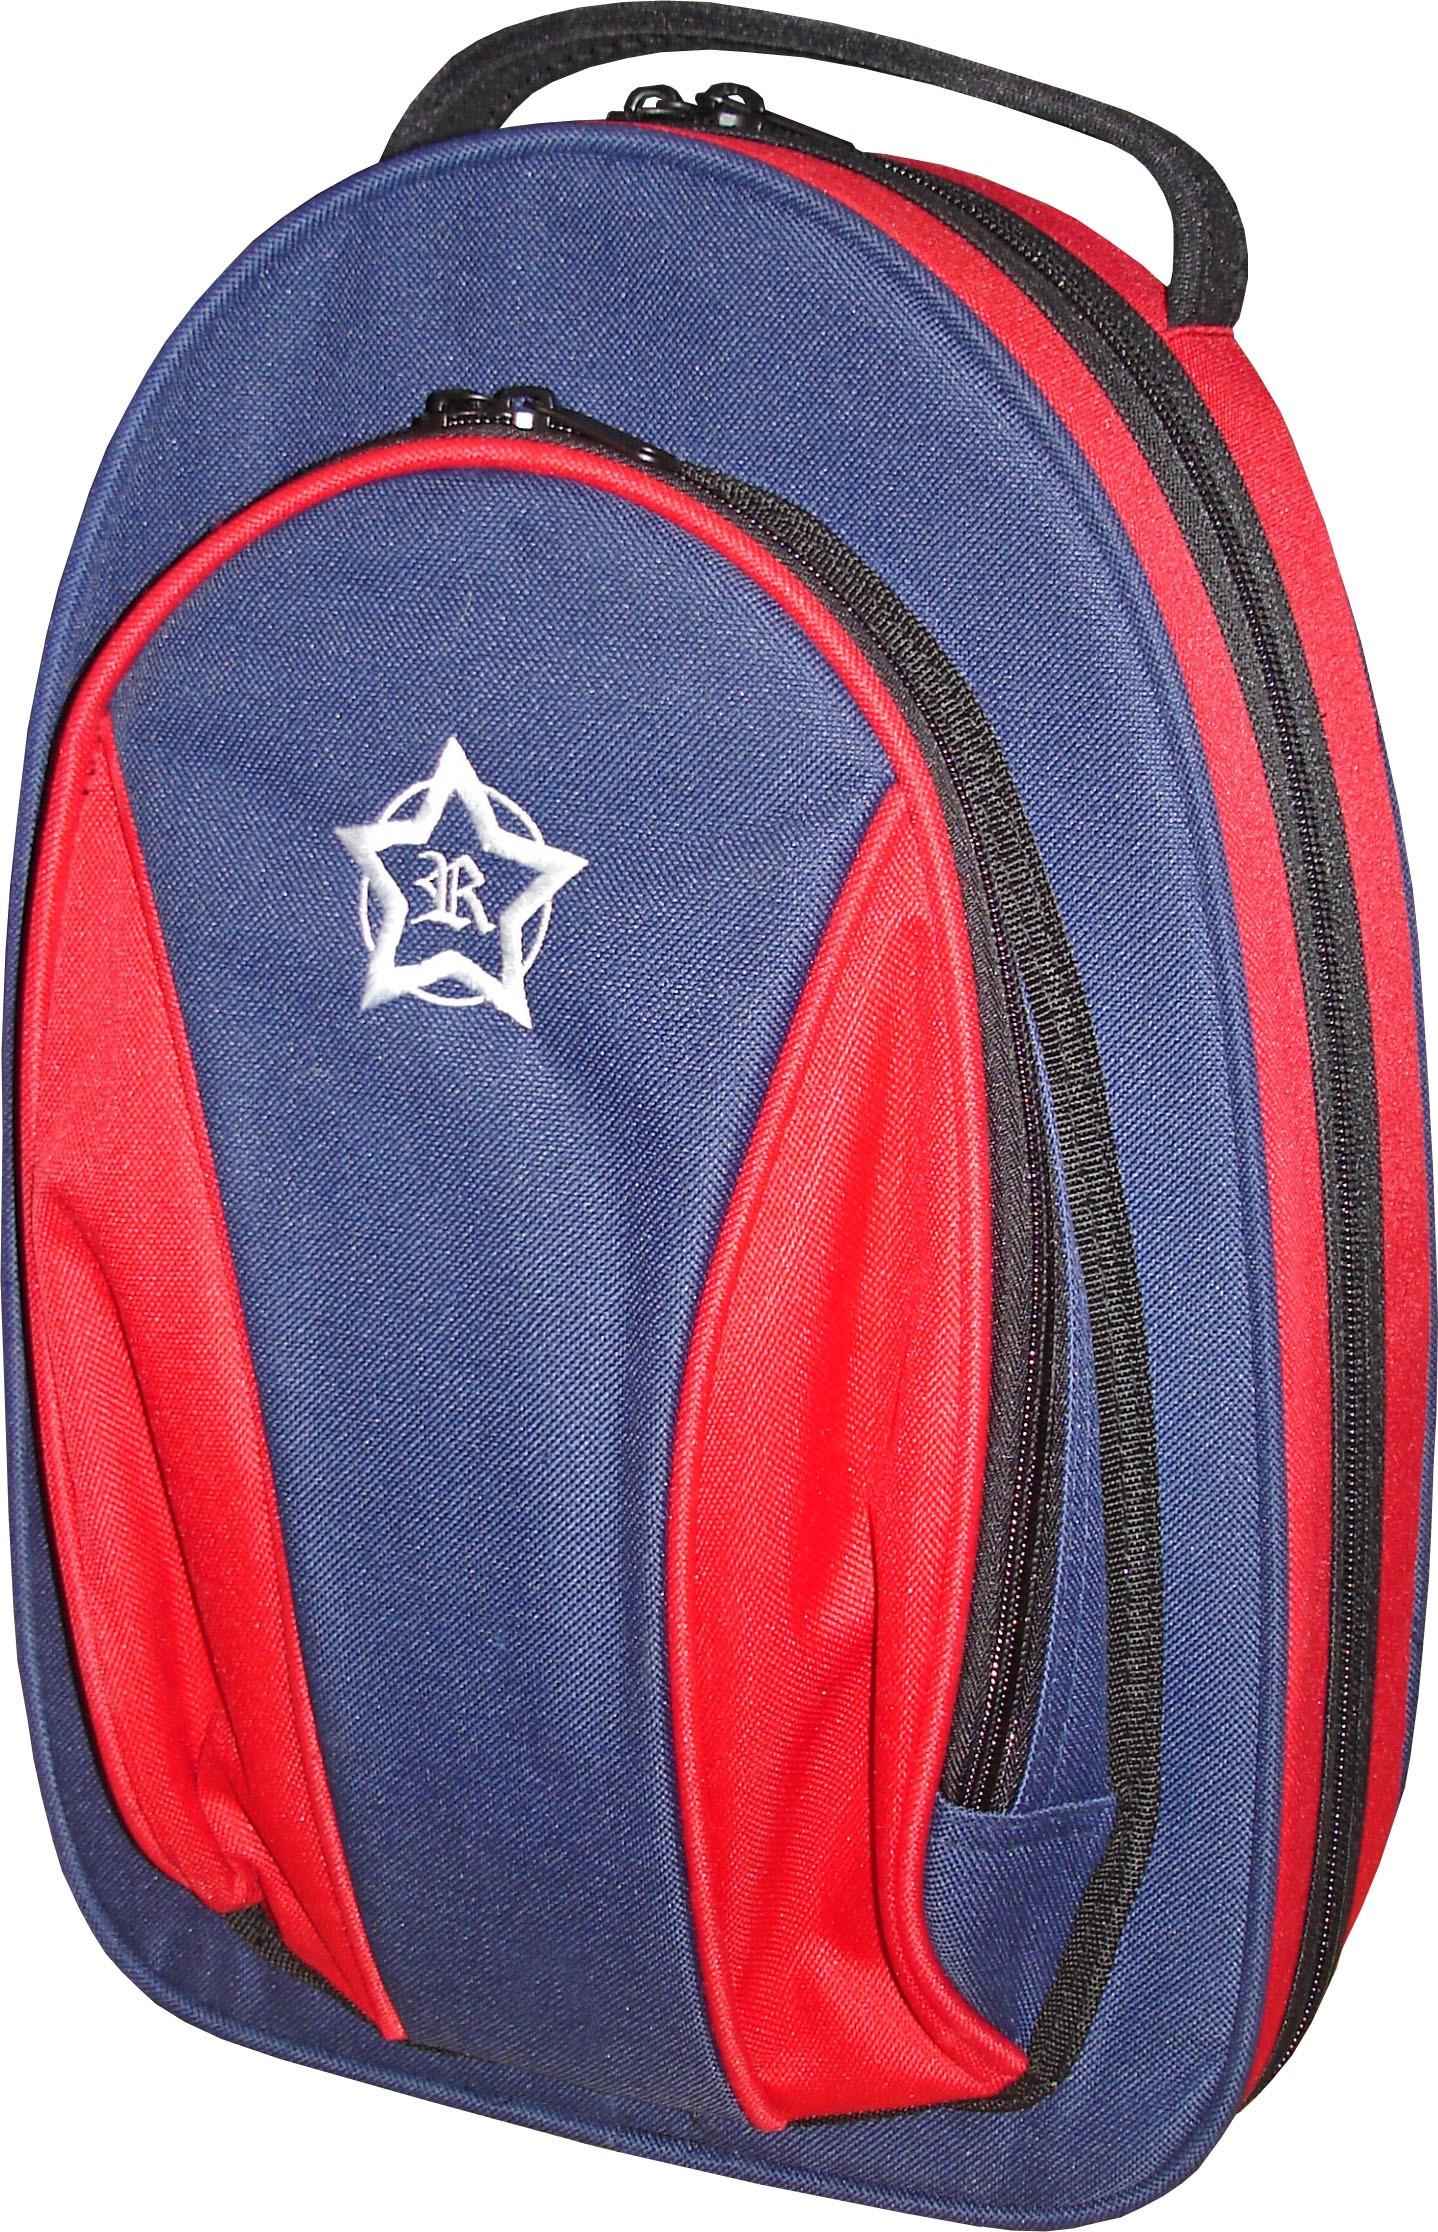 Rosetti Clarinet Bag